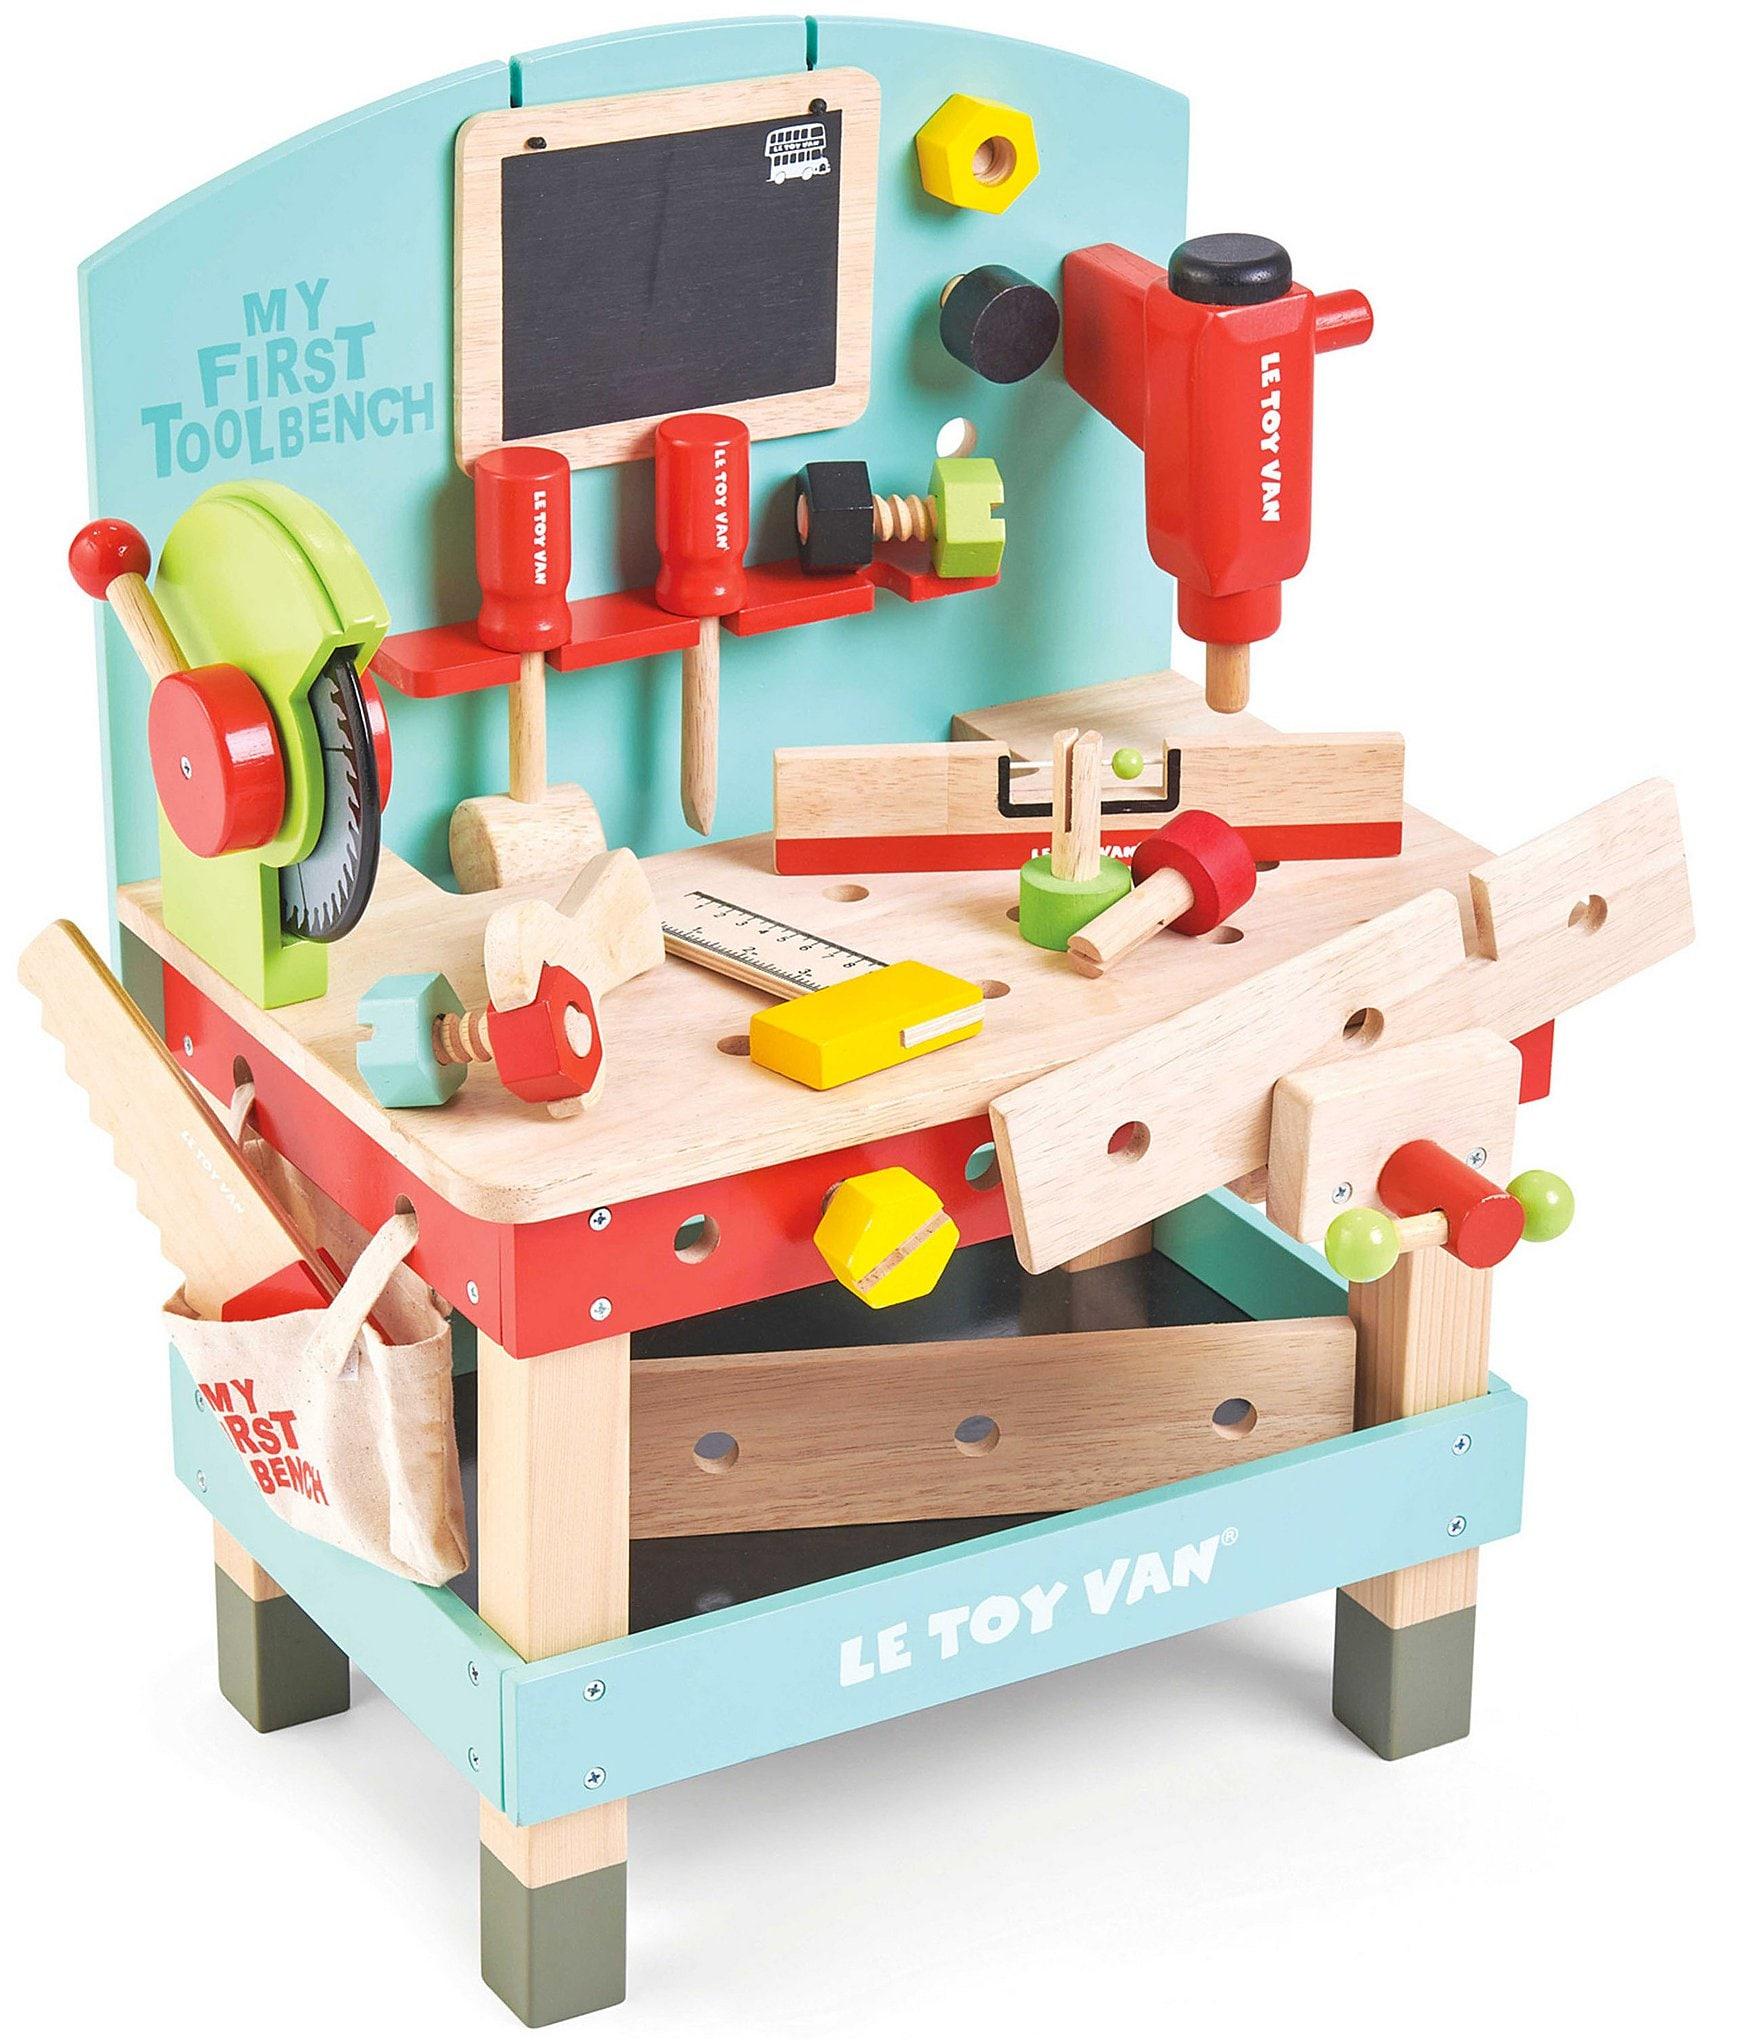 Sensational Le Toy Van Honeybake My First Tool Bench Theyellowbook Wood Chair Design Ideas Theyellowbookinfo